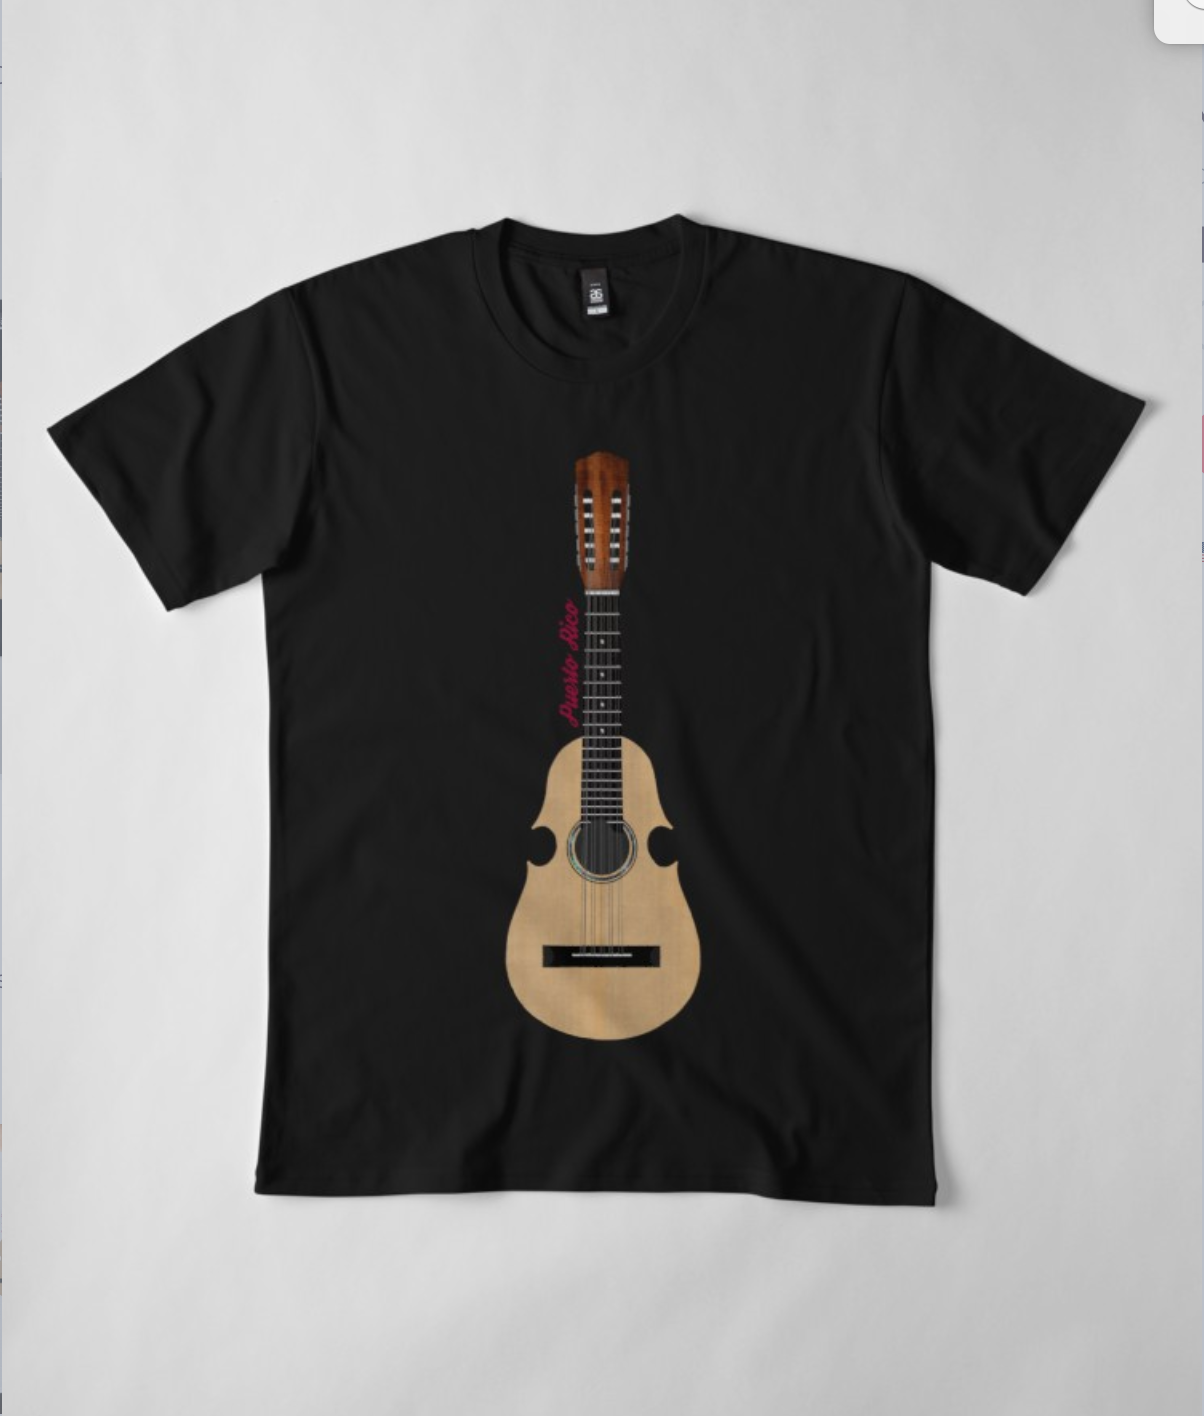 f61e03cf189 Men s Premium T-Shirt  cuatropuertorico  cuatropuertorico  music   musicalinstrument  cuatrista  cuatroplayer